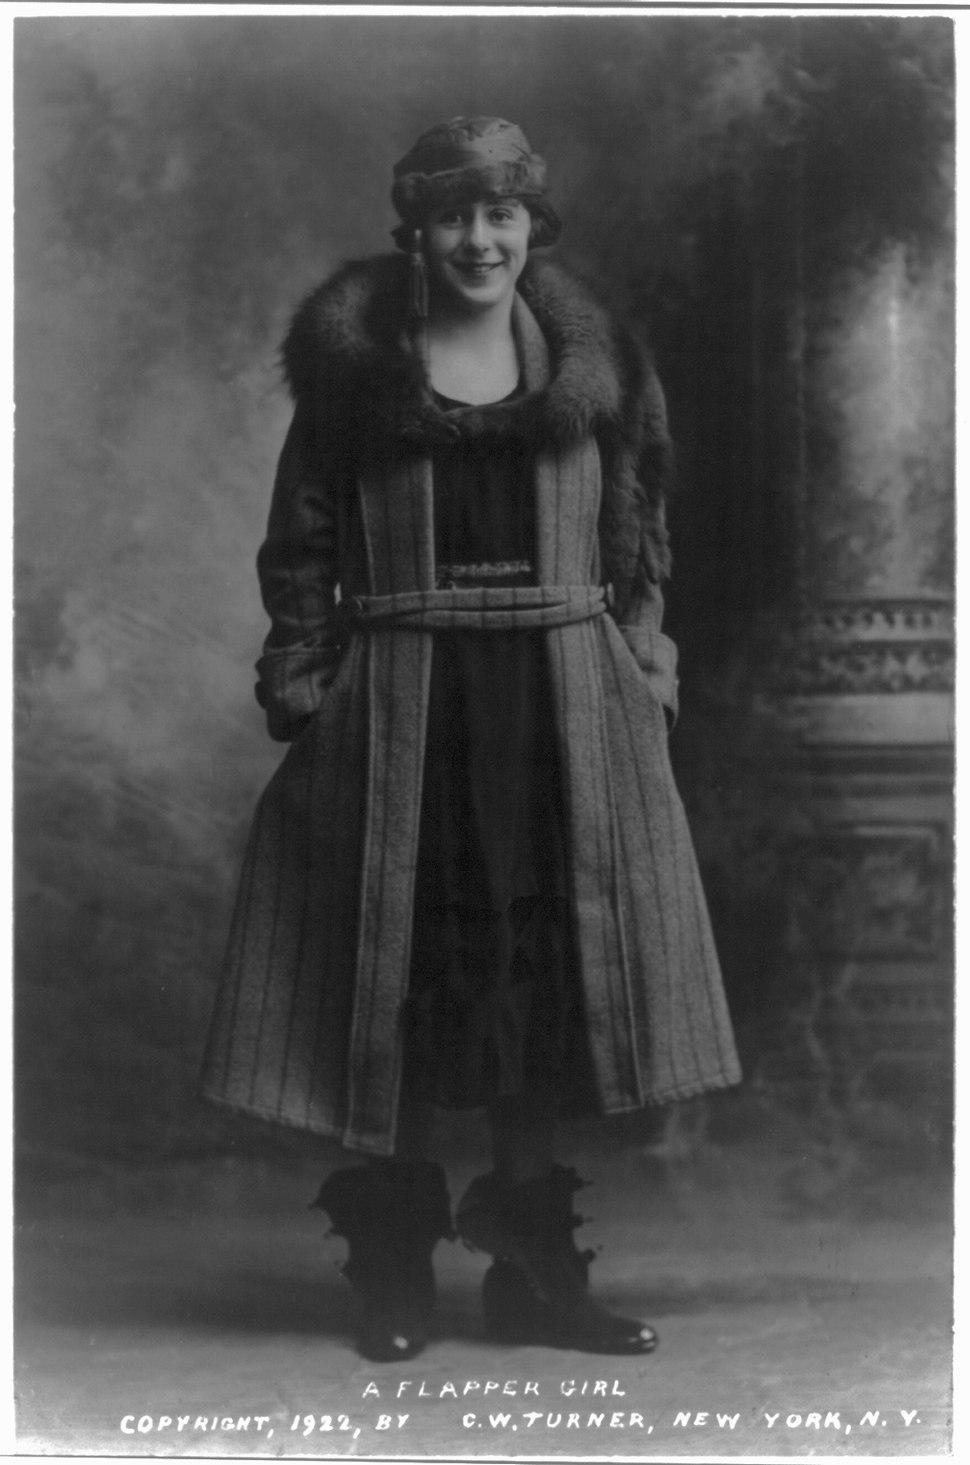 A flapper girl LCCN2012645724